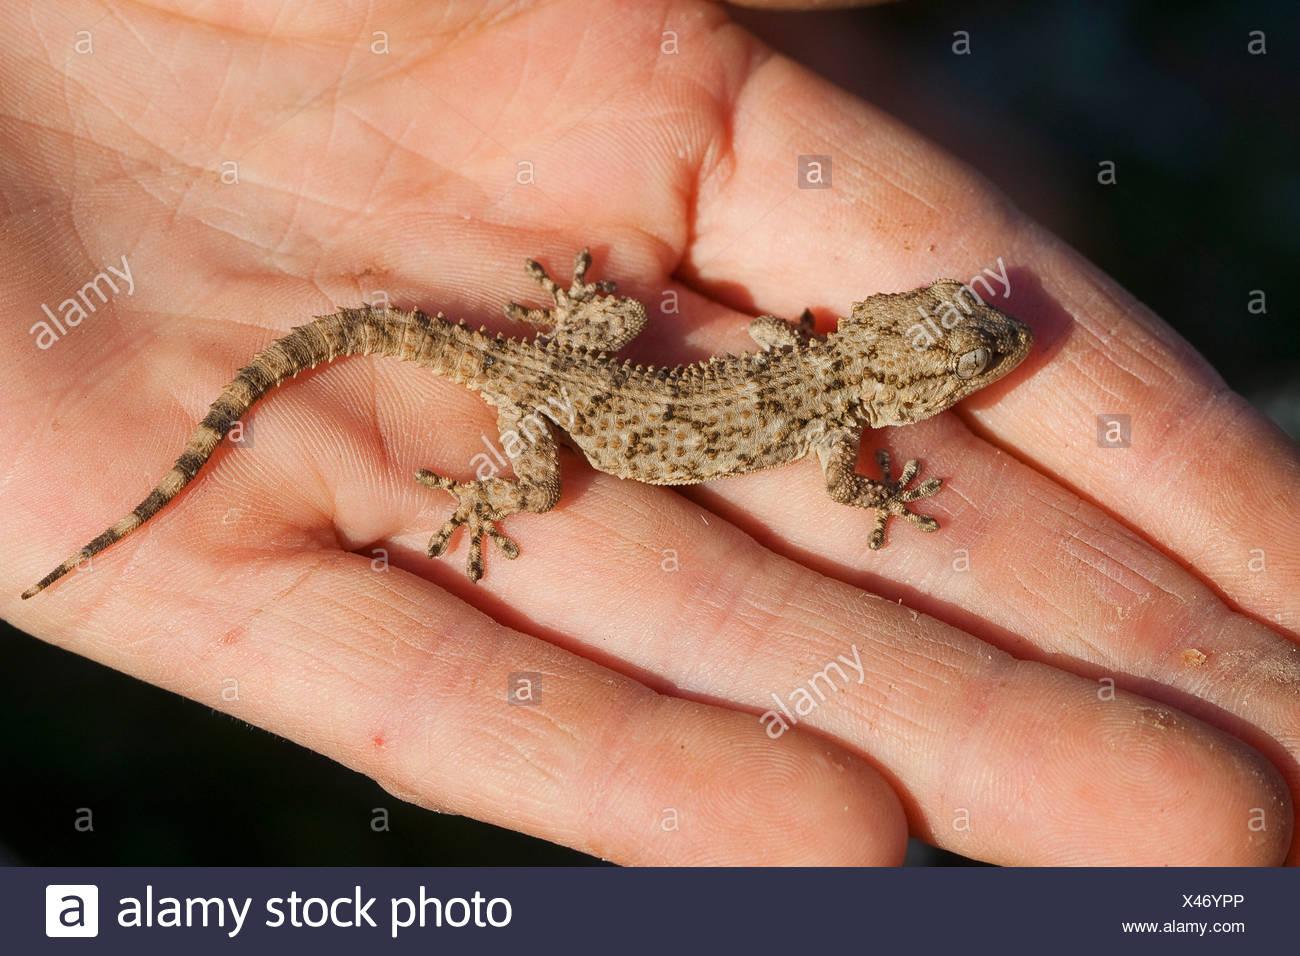 common wall gecko, Moorish gecko (Tarentola mauritanica), sitting on a hand - Stock Image